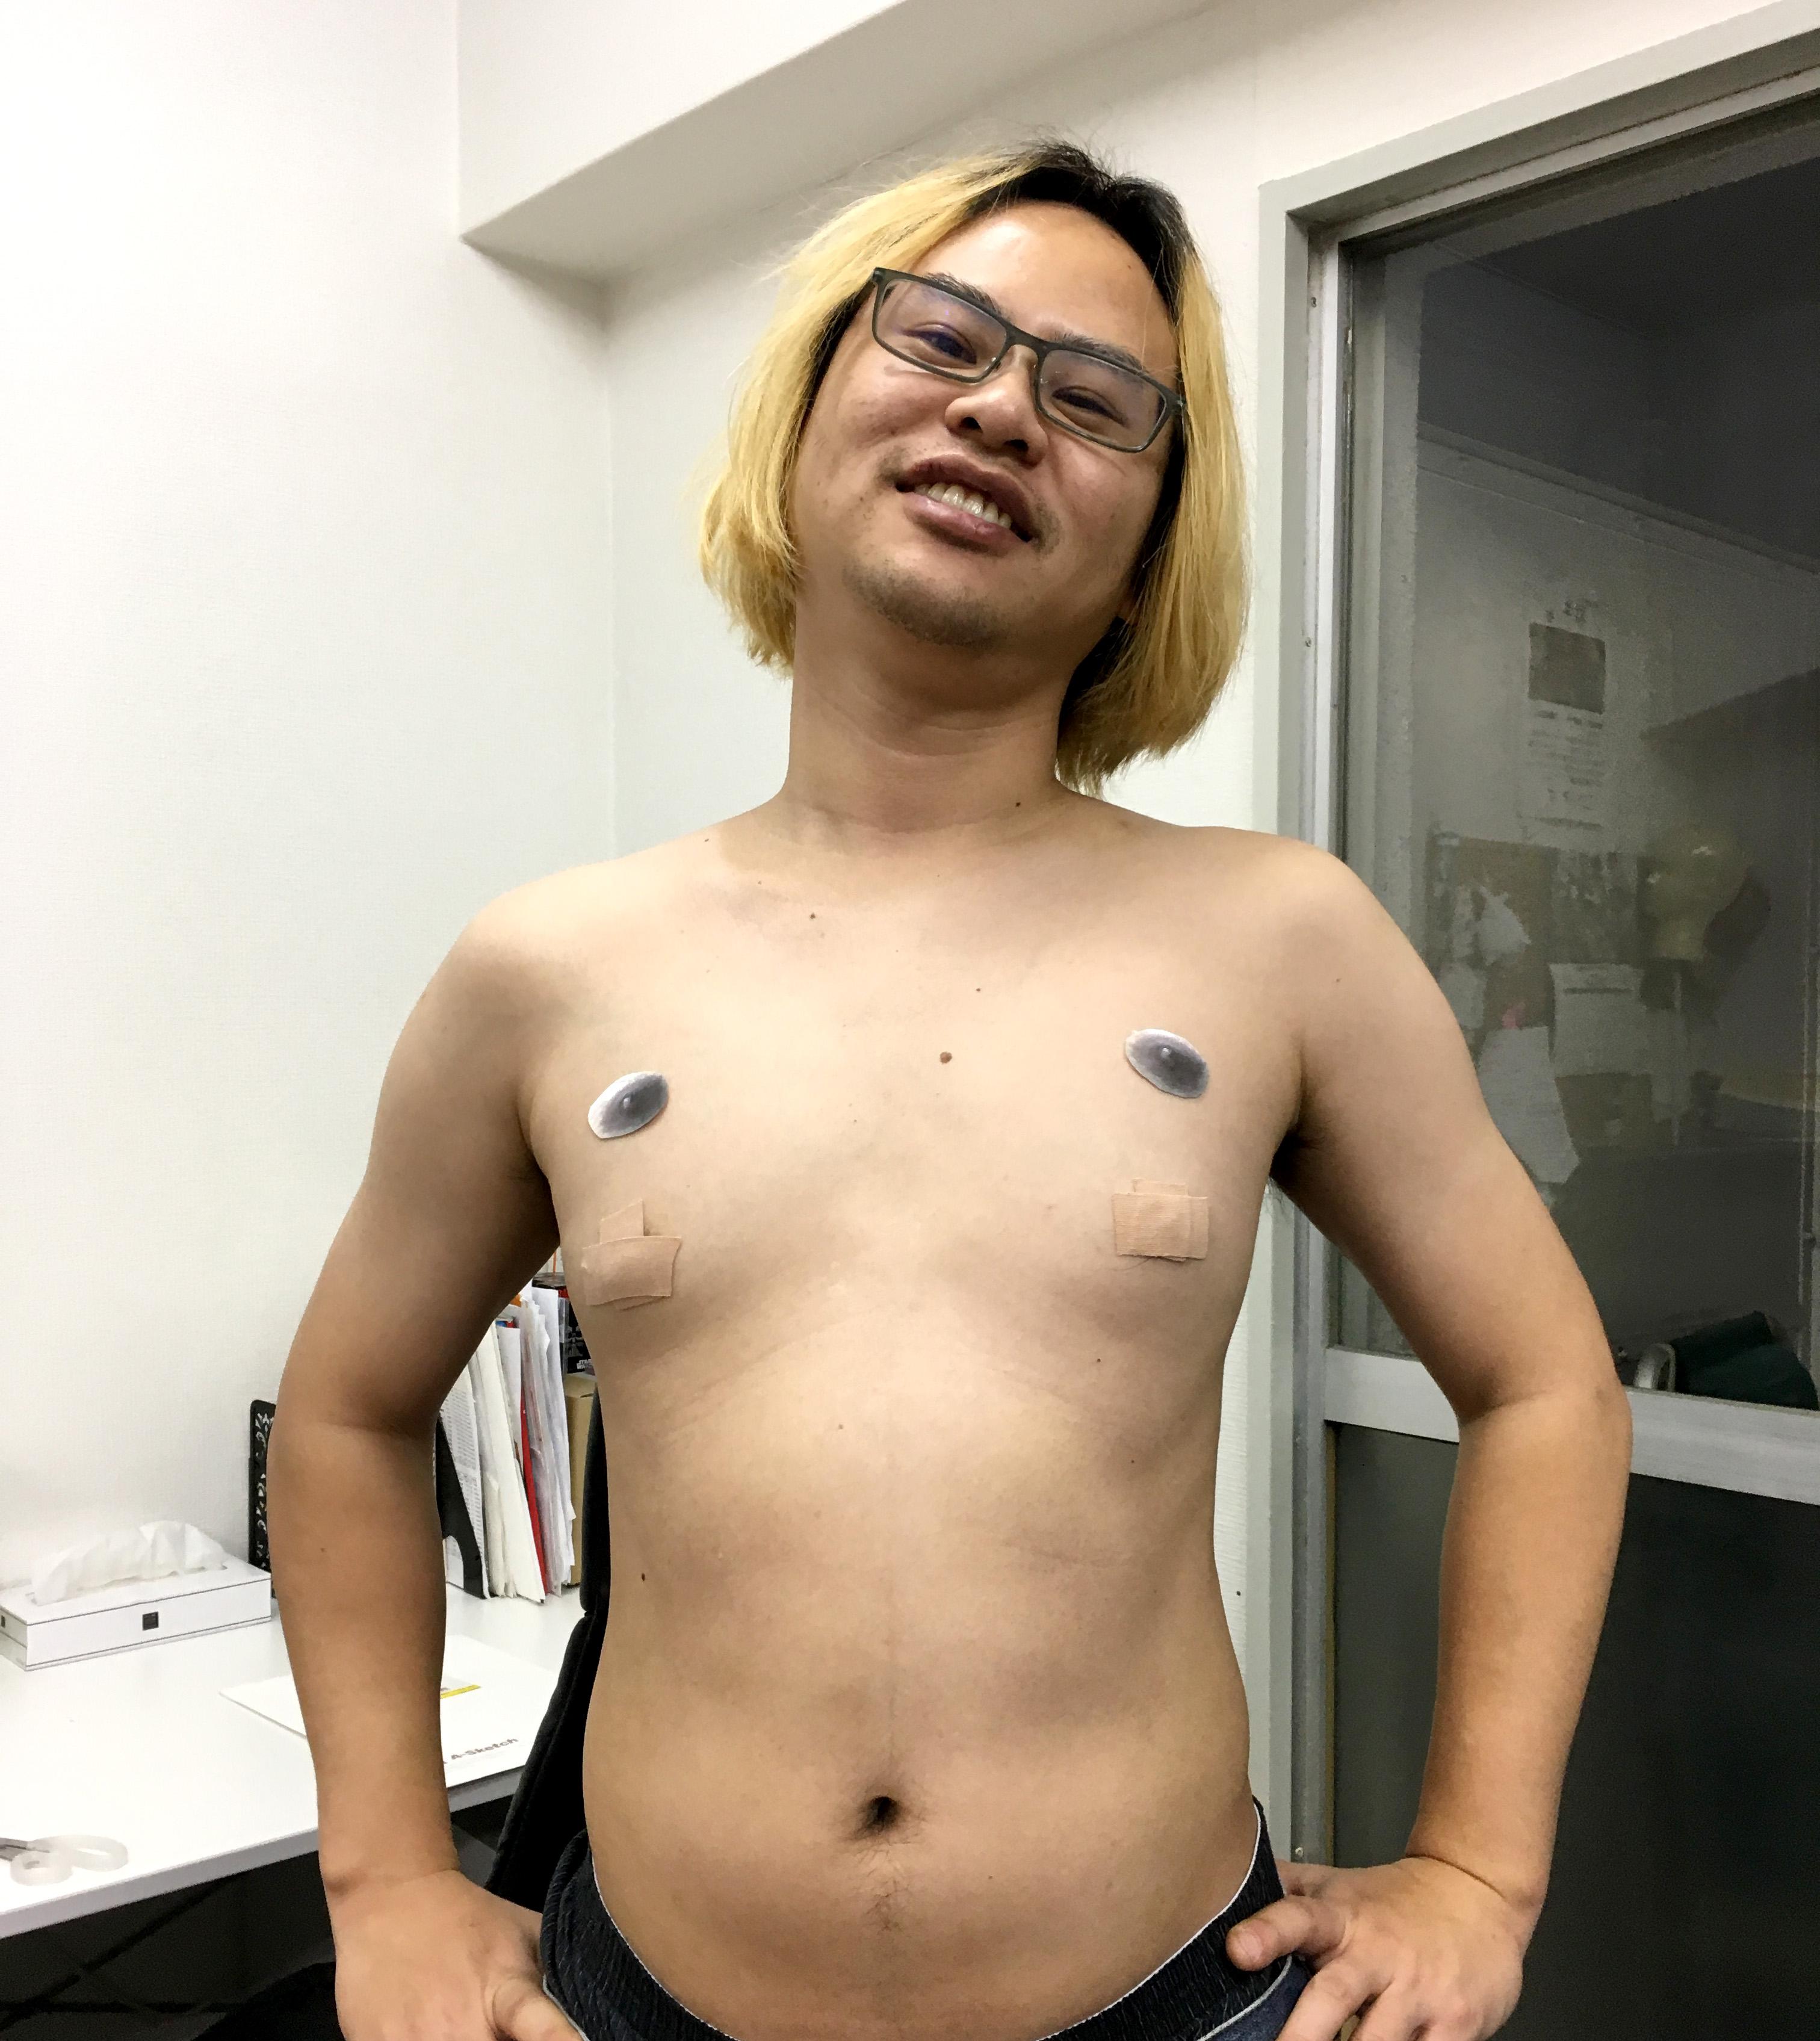 chikubi5